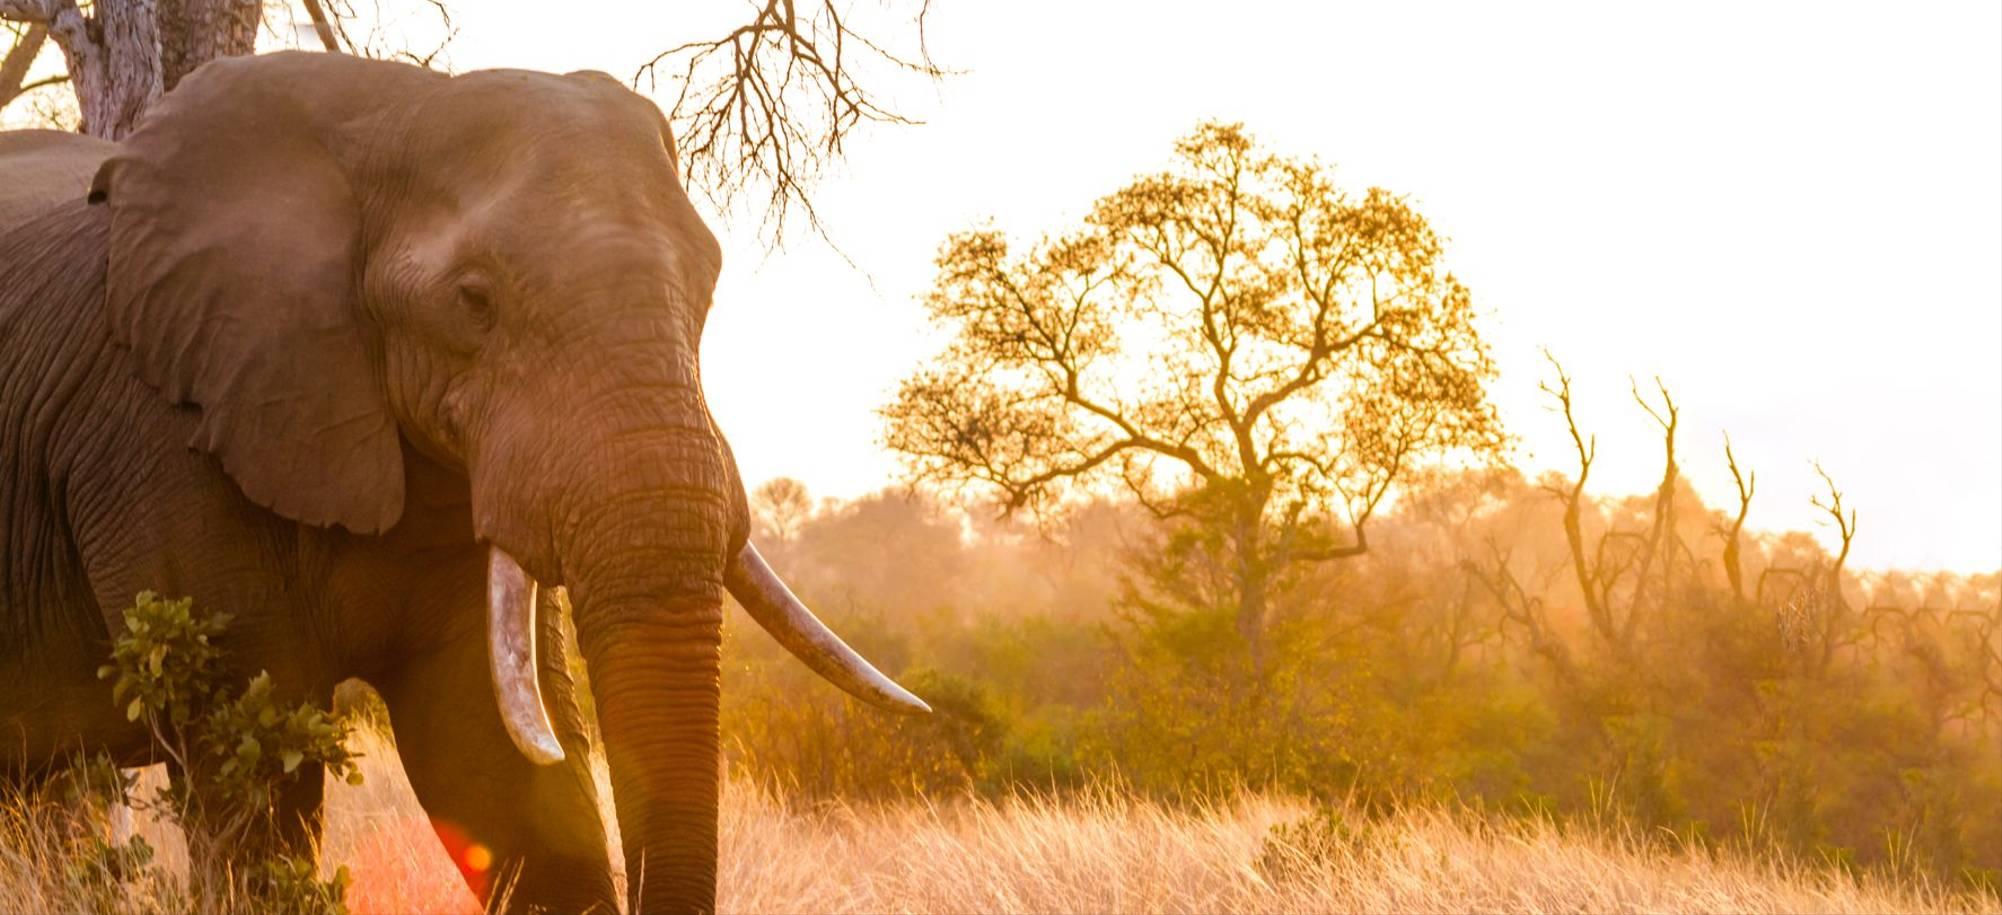 Kruger - Elephant - Itinerary Desktop .jpg